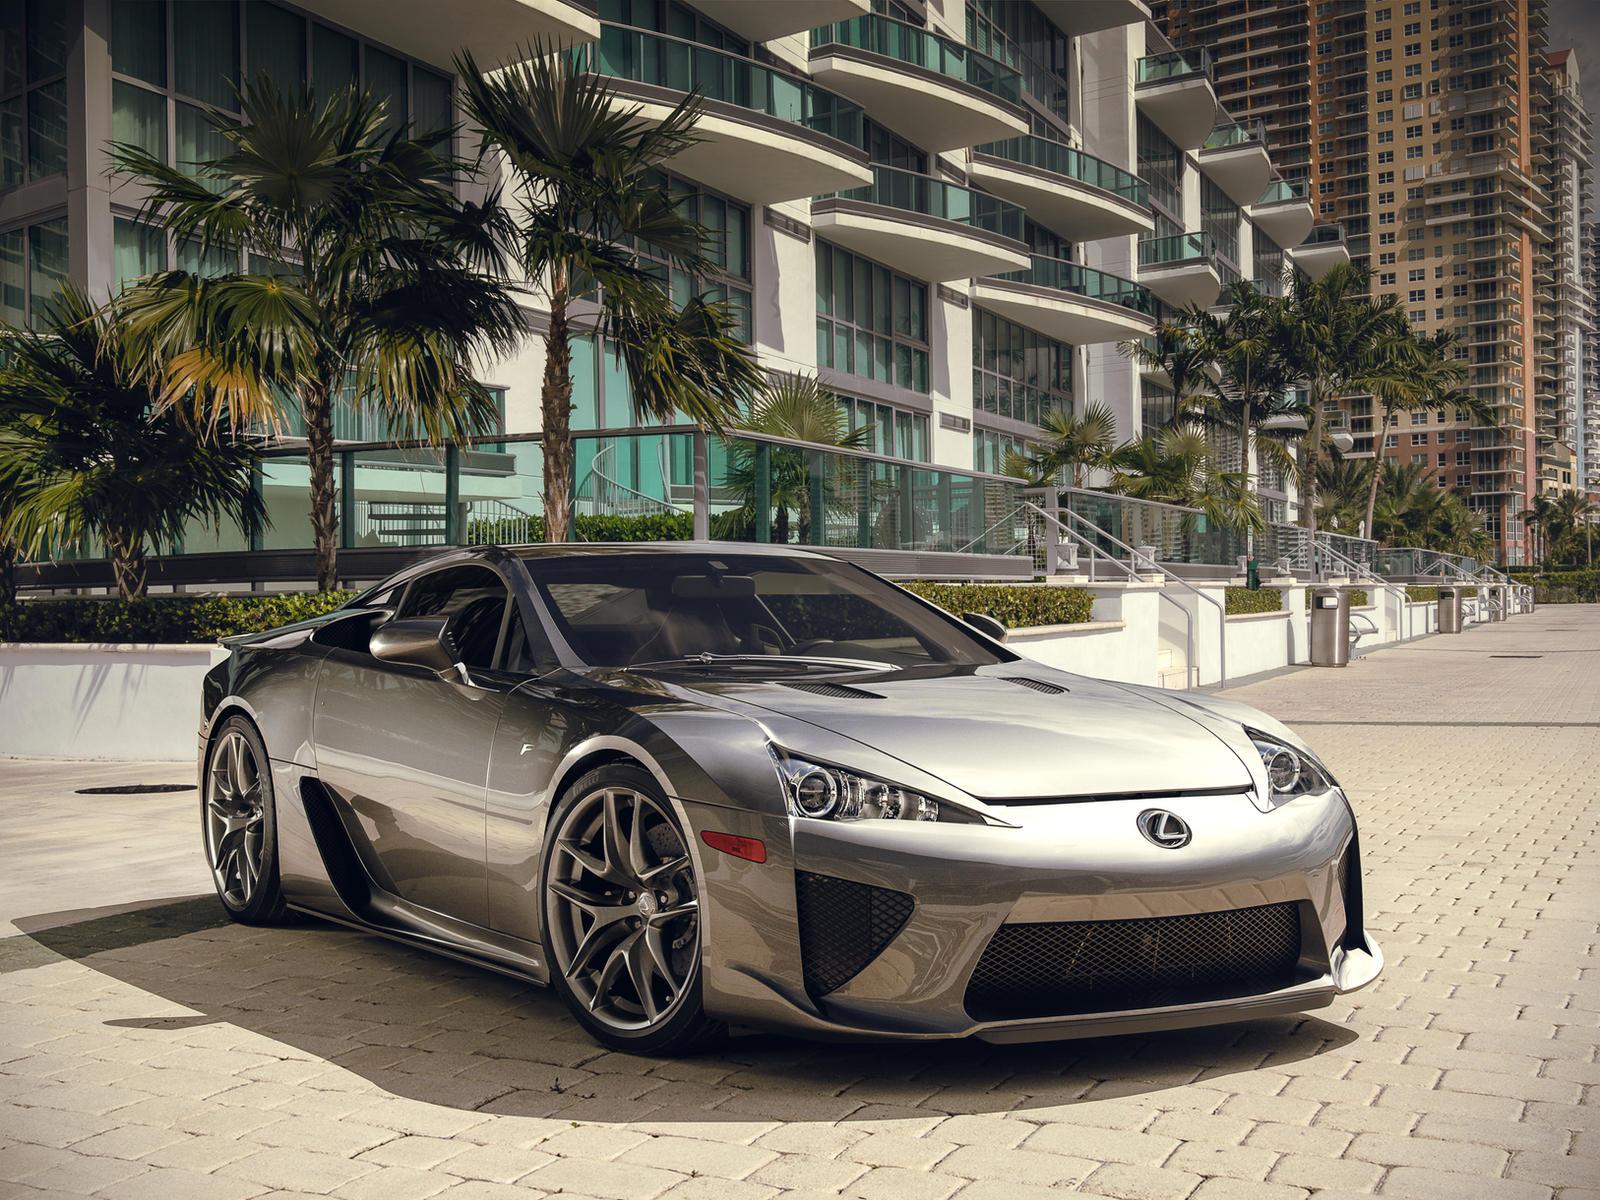 Lexus LFA by Laffonte